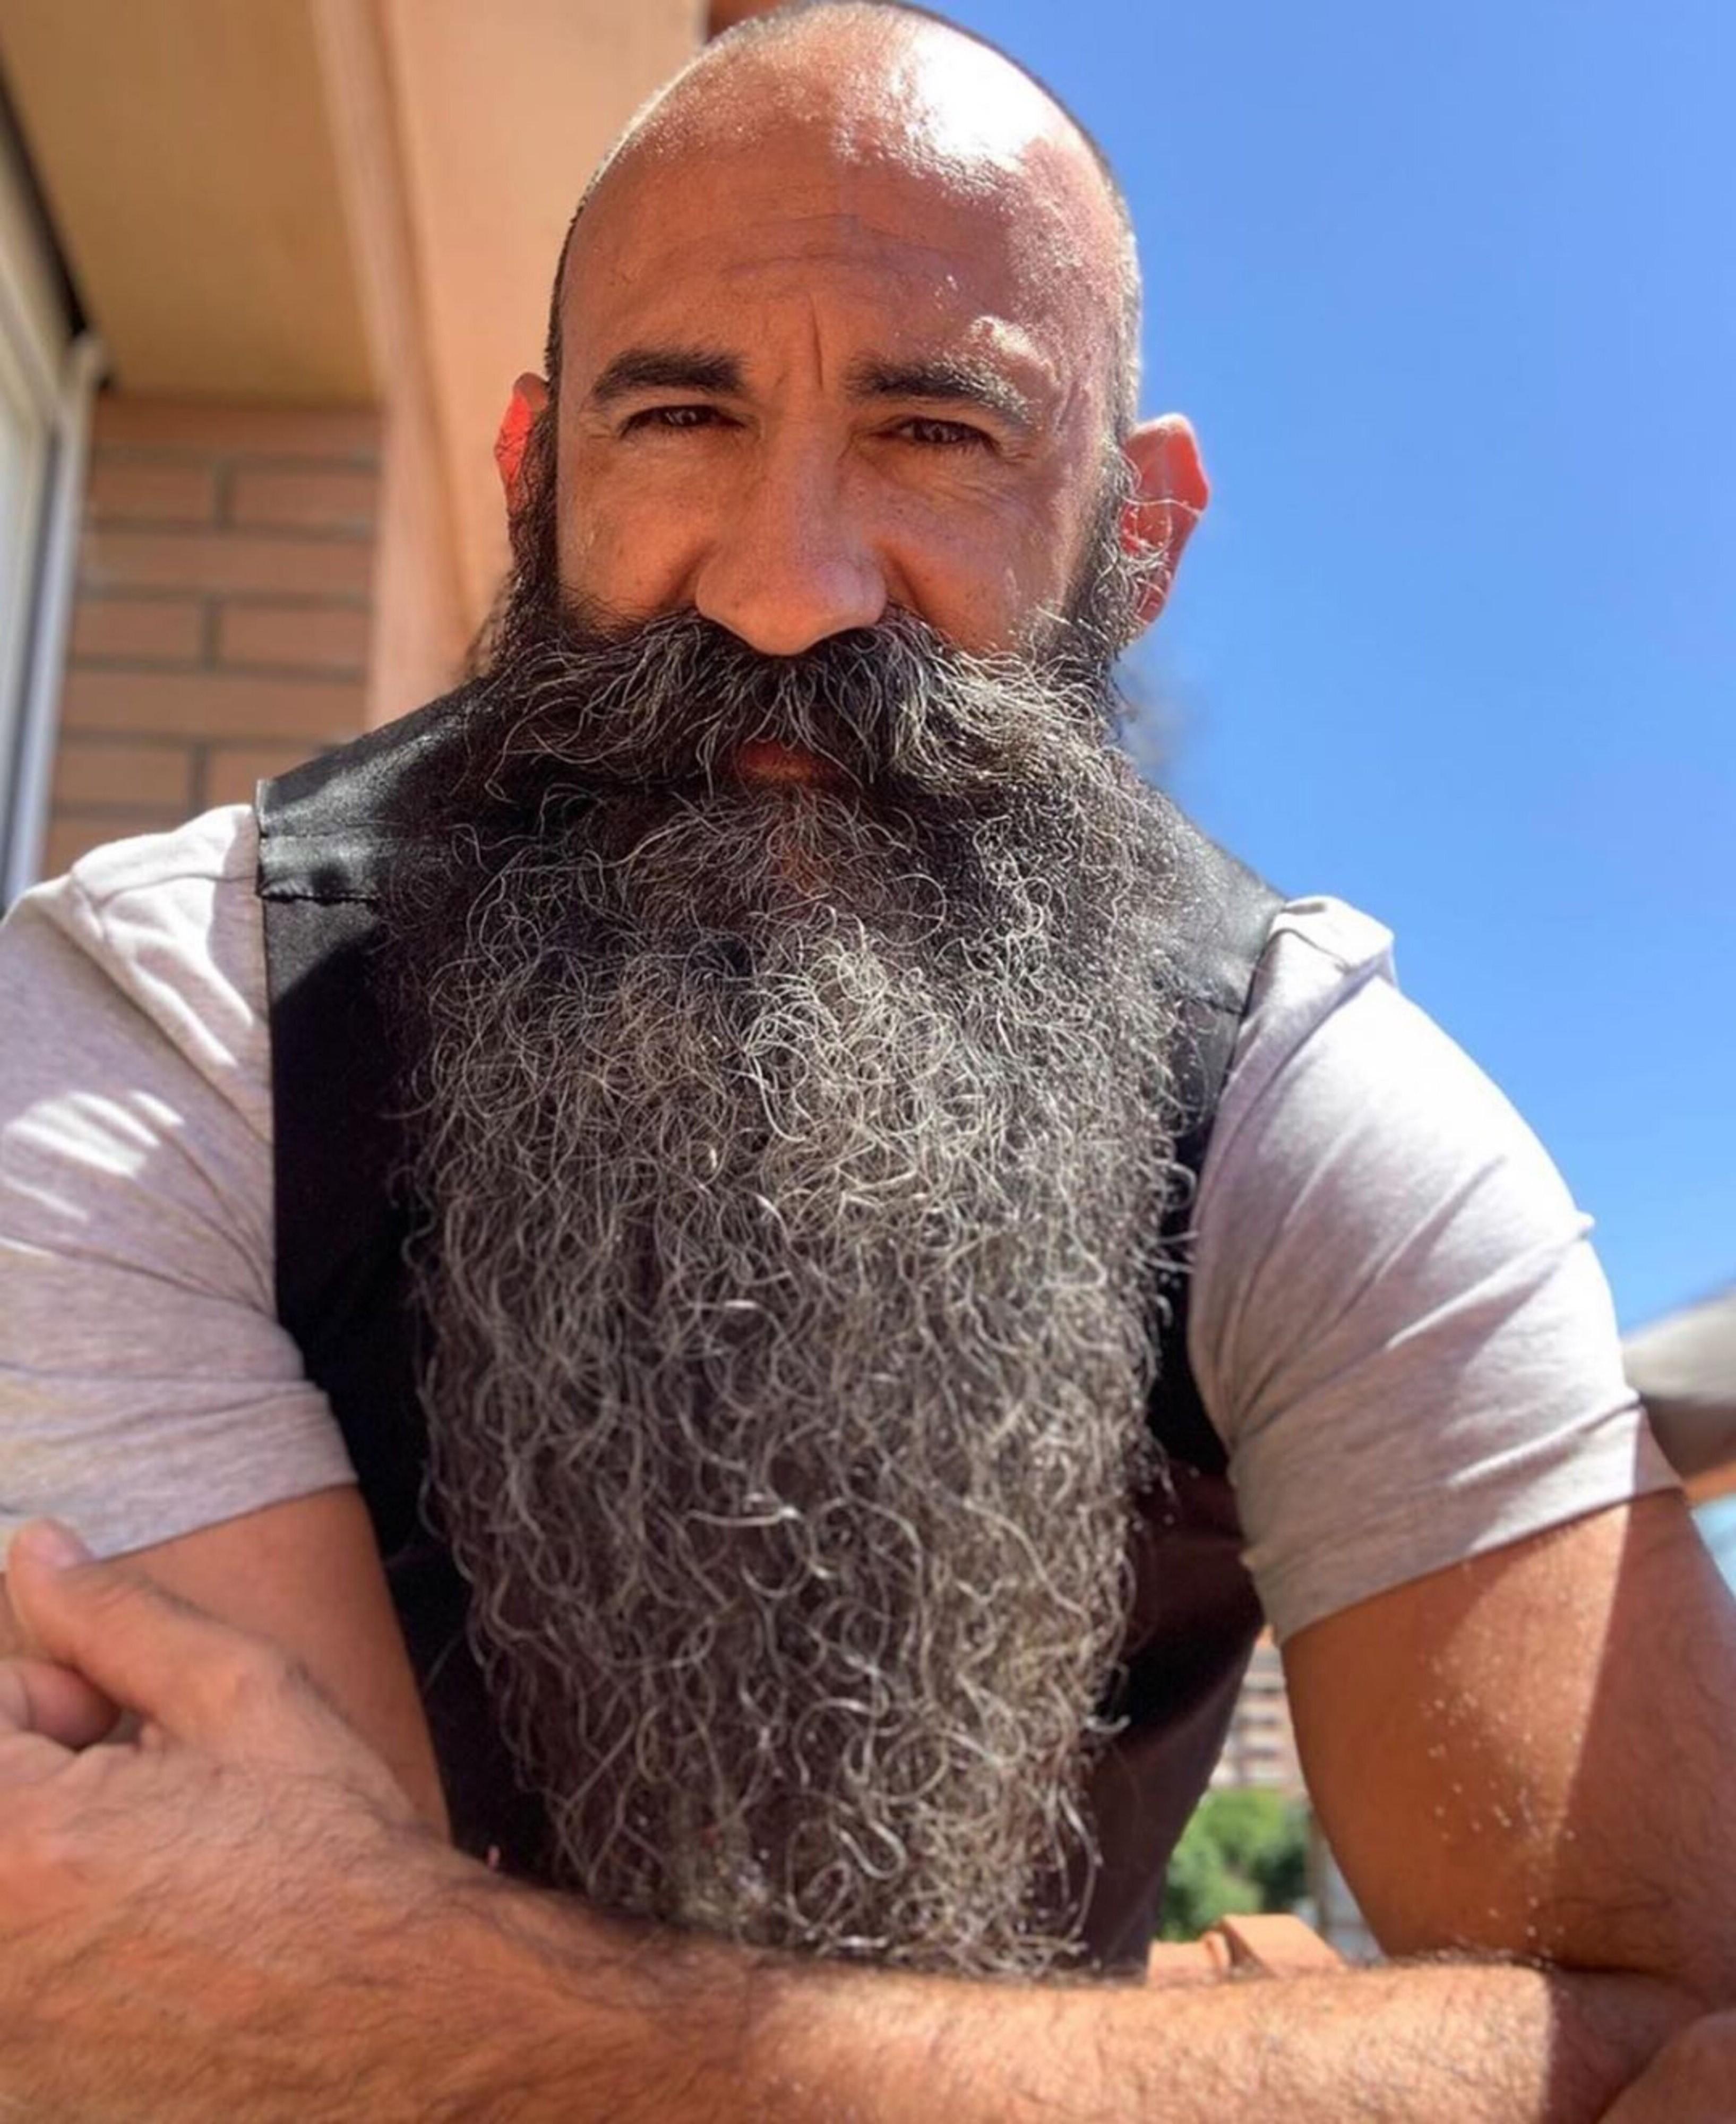 An impressively long beard.